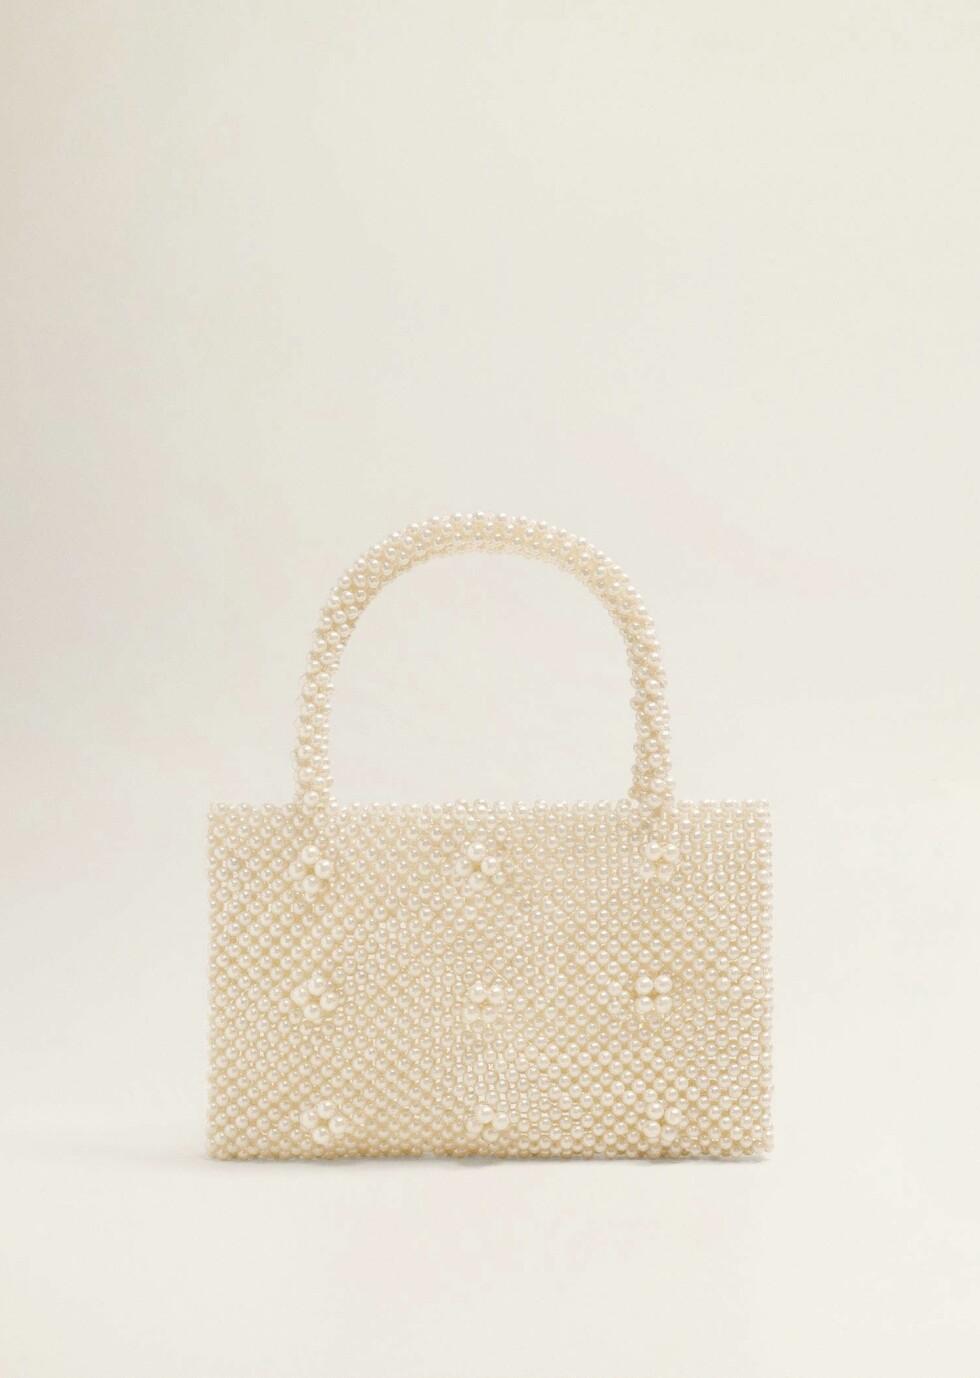 Veske fra Mango |500,-| https://shop.mango.com/no-en/women/bags-handbags/pearls-bag_33050996.html?c=01&n=1&s=accesorios_she.accesorio;40,340,440